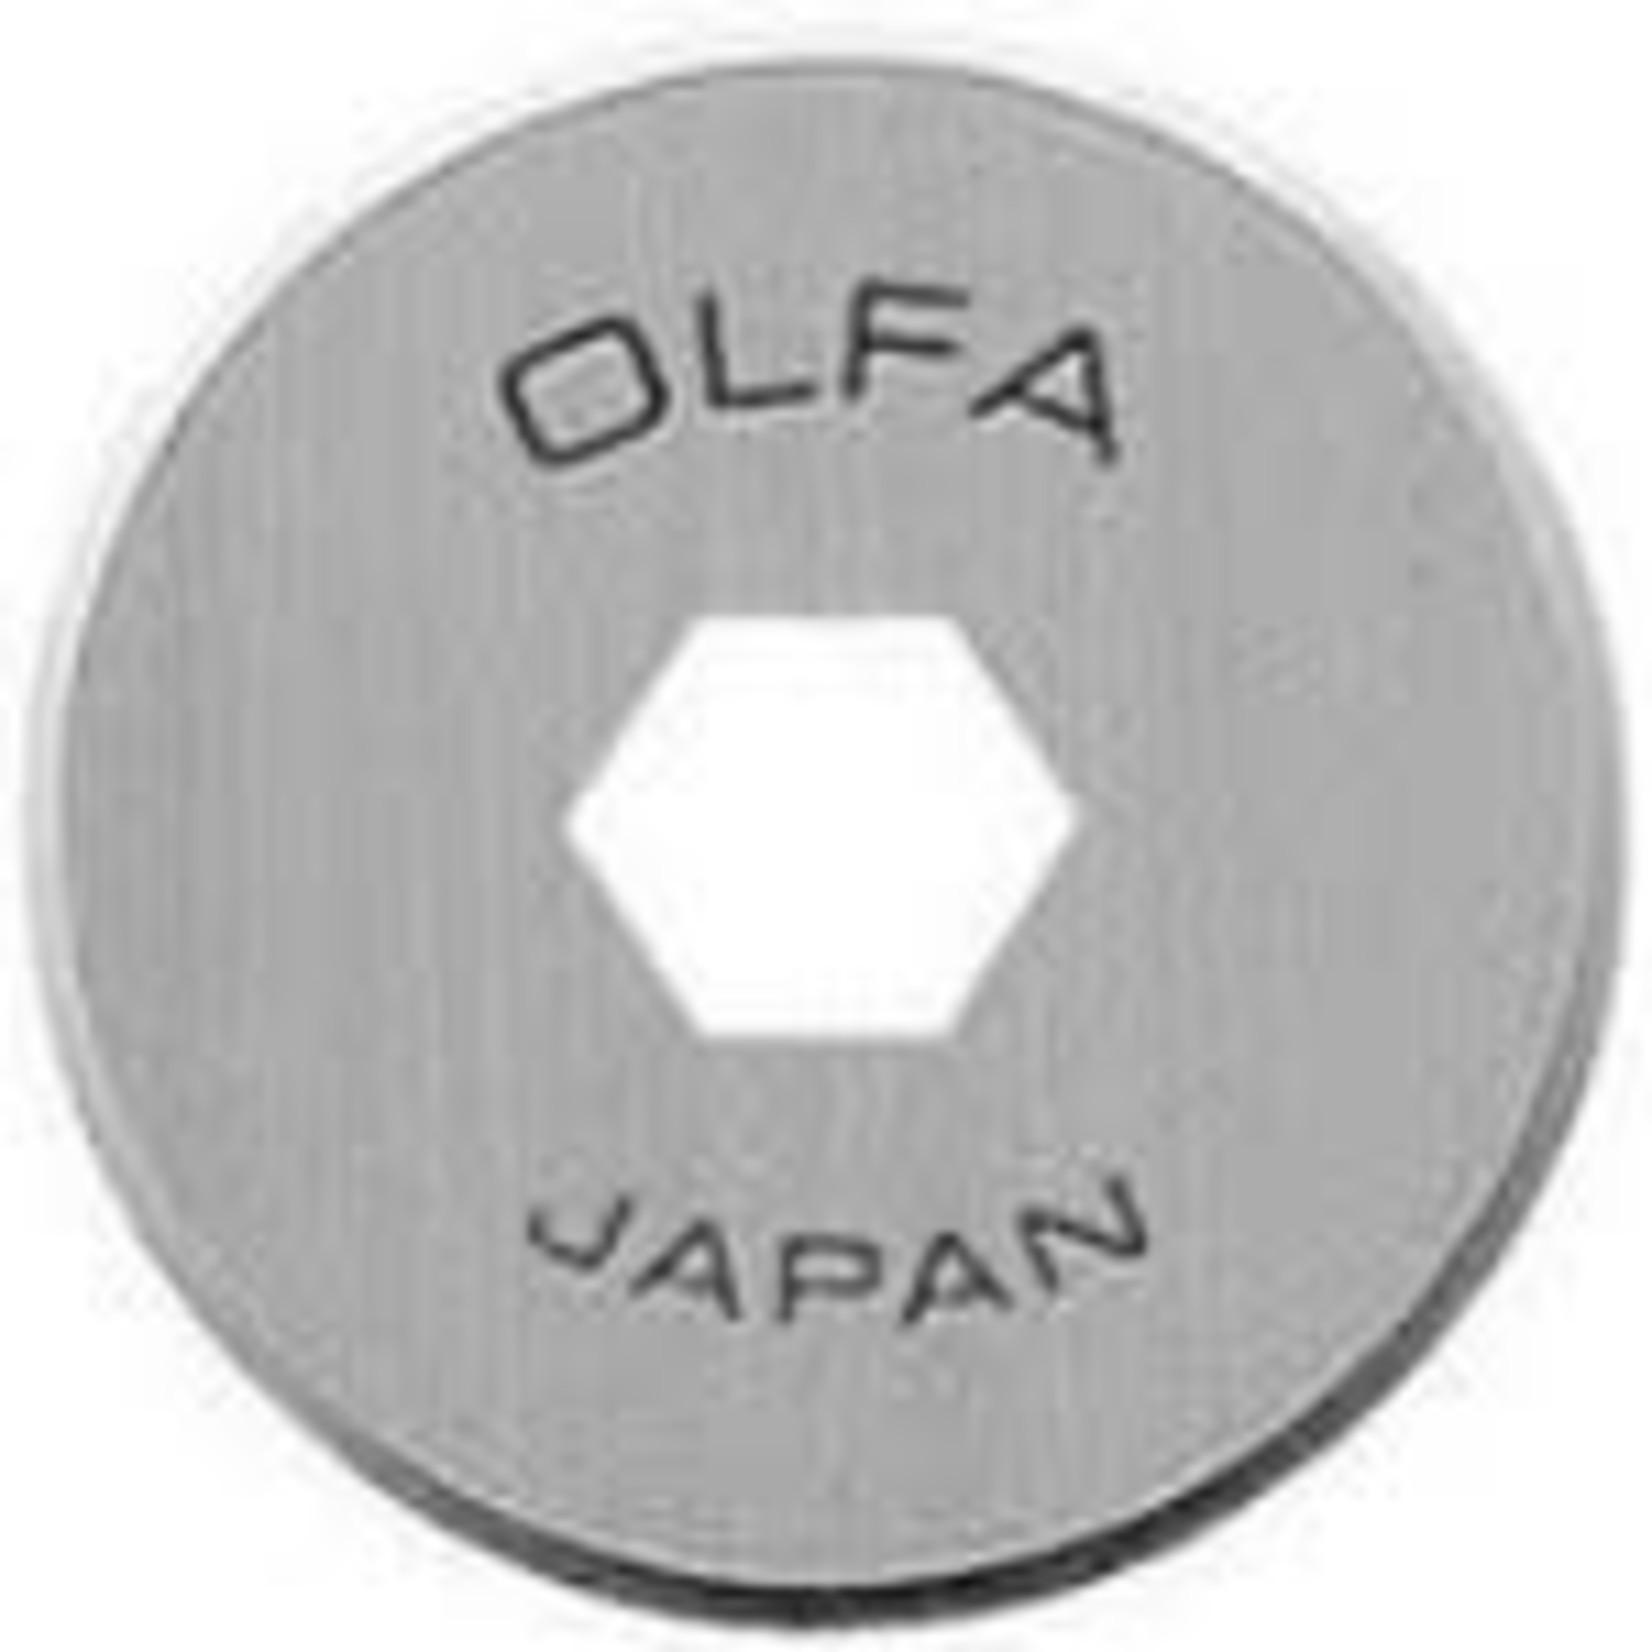 OLFA OLFA ROTARY BLADES 18mm (2 pack)